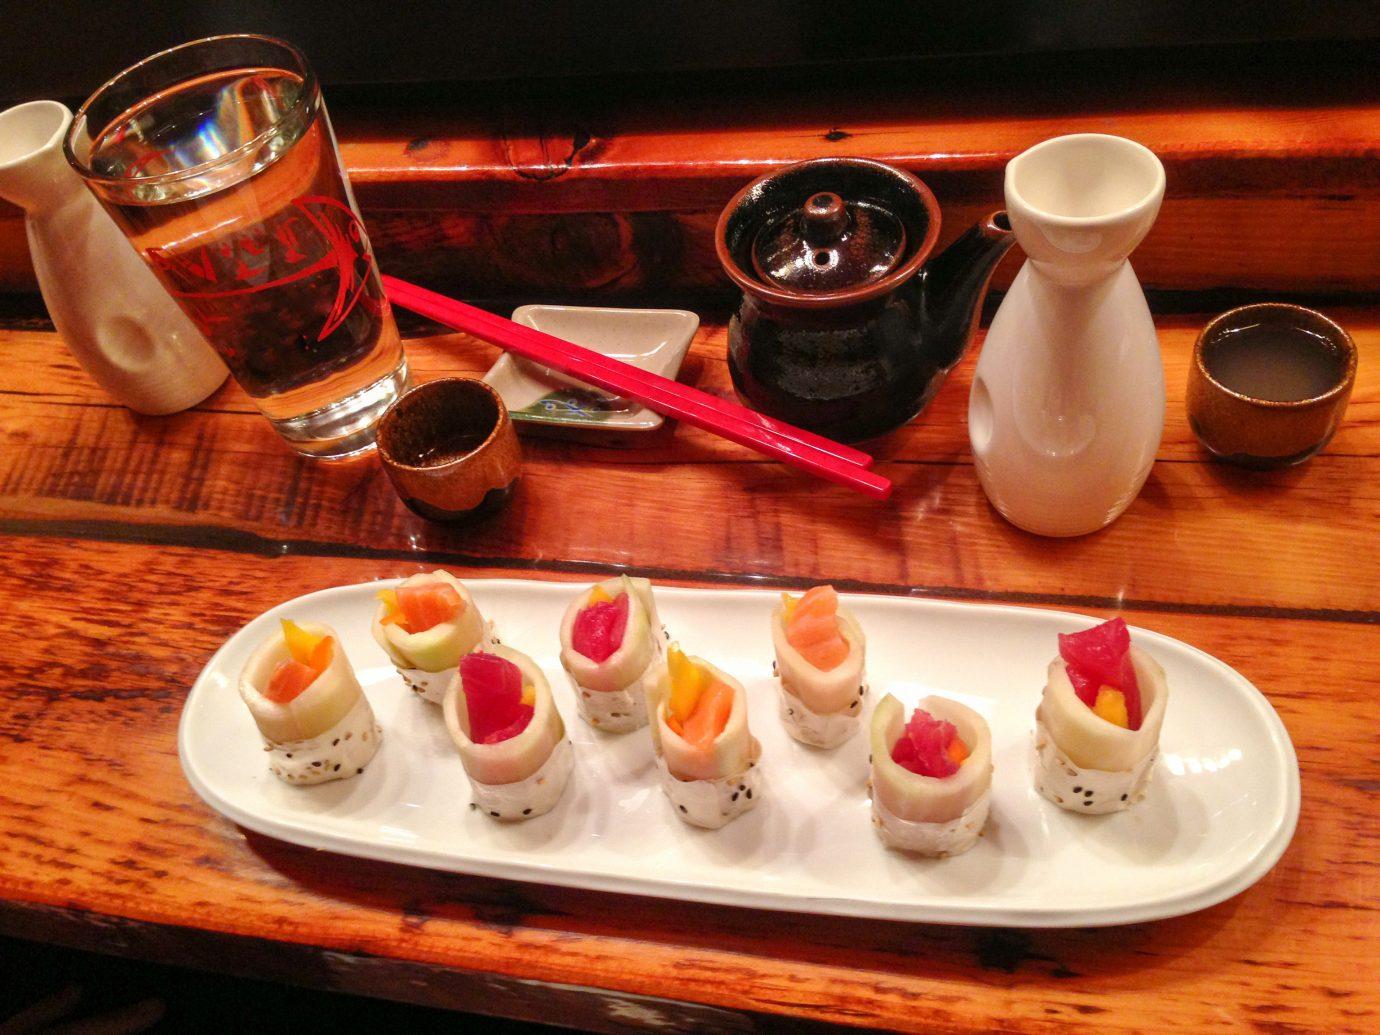 Adventure table plate coffee cuisine food dessert appetizer dish asian food Drink finger food breakfast japanese cuisine flavor meal